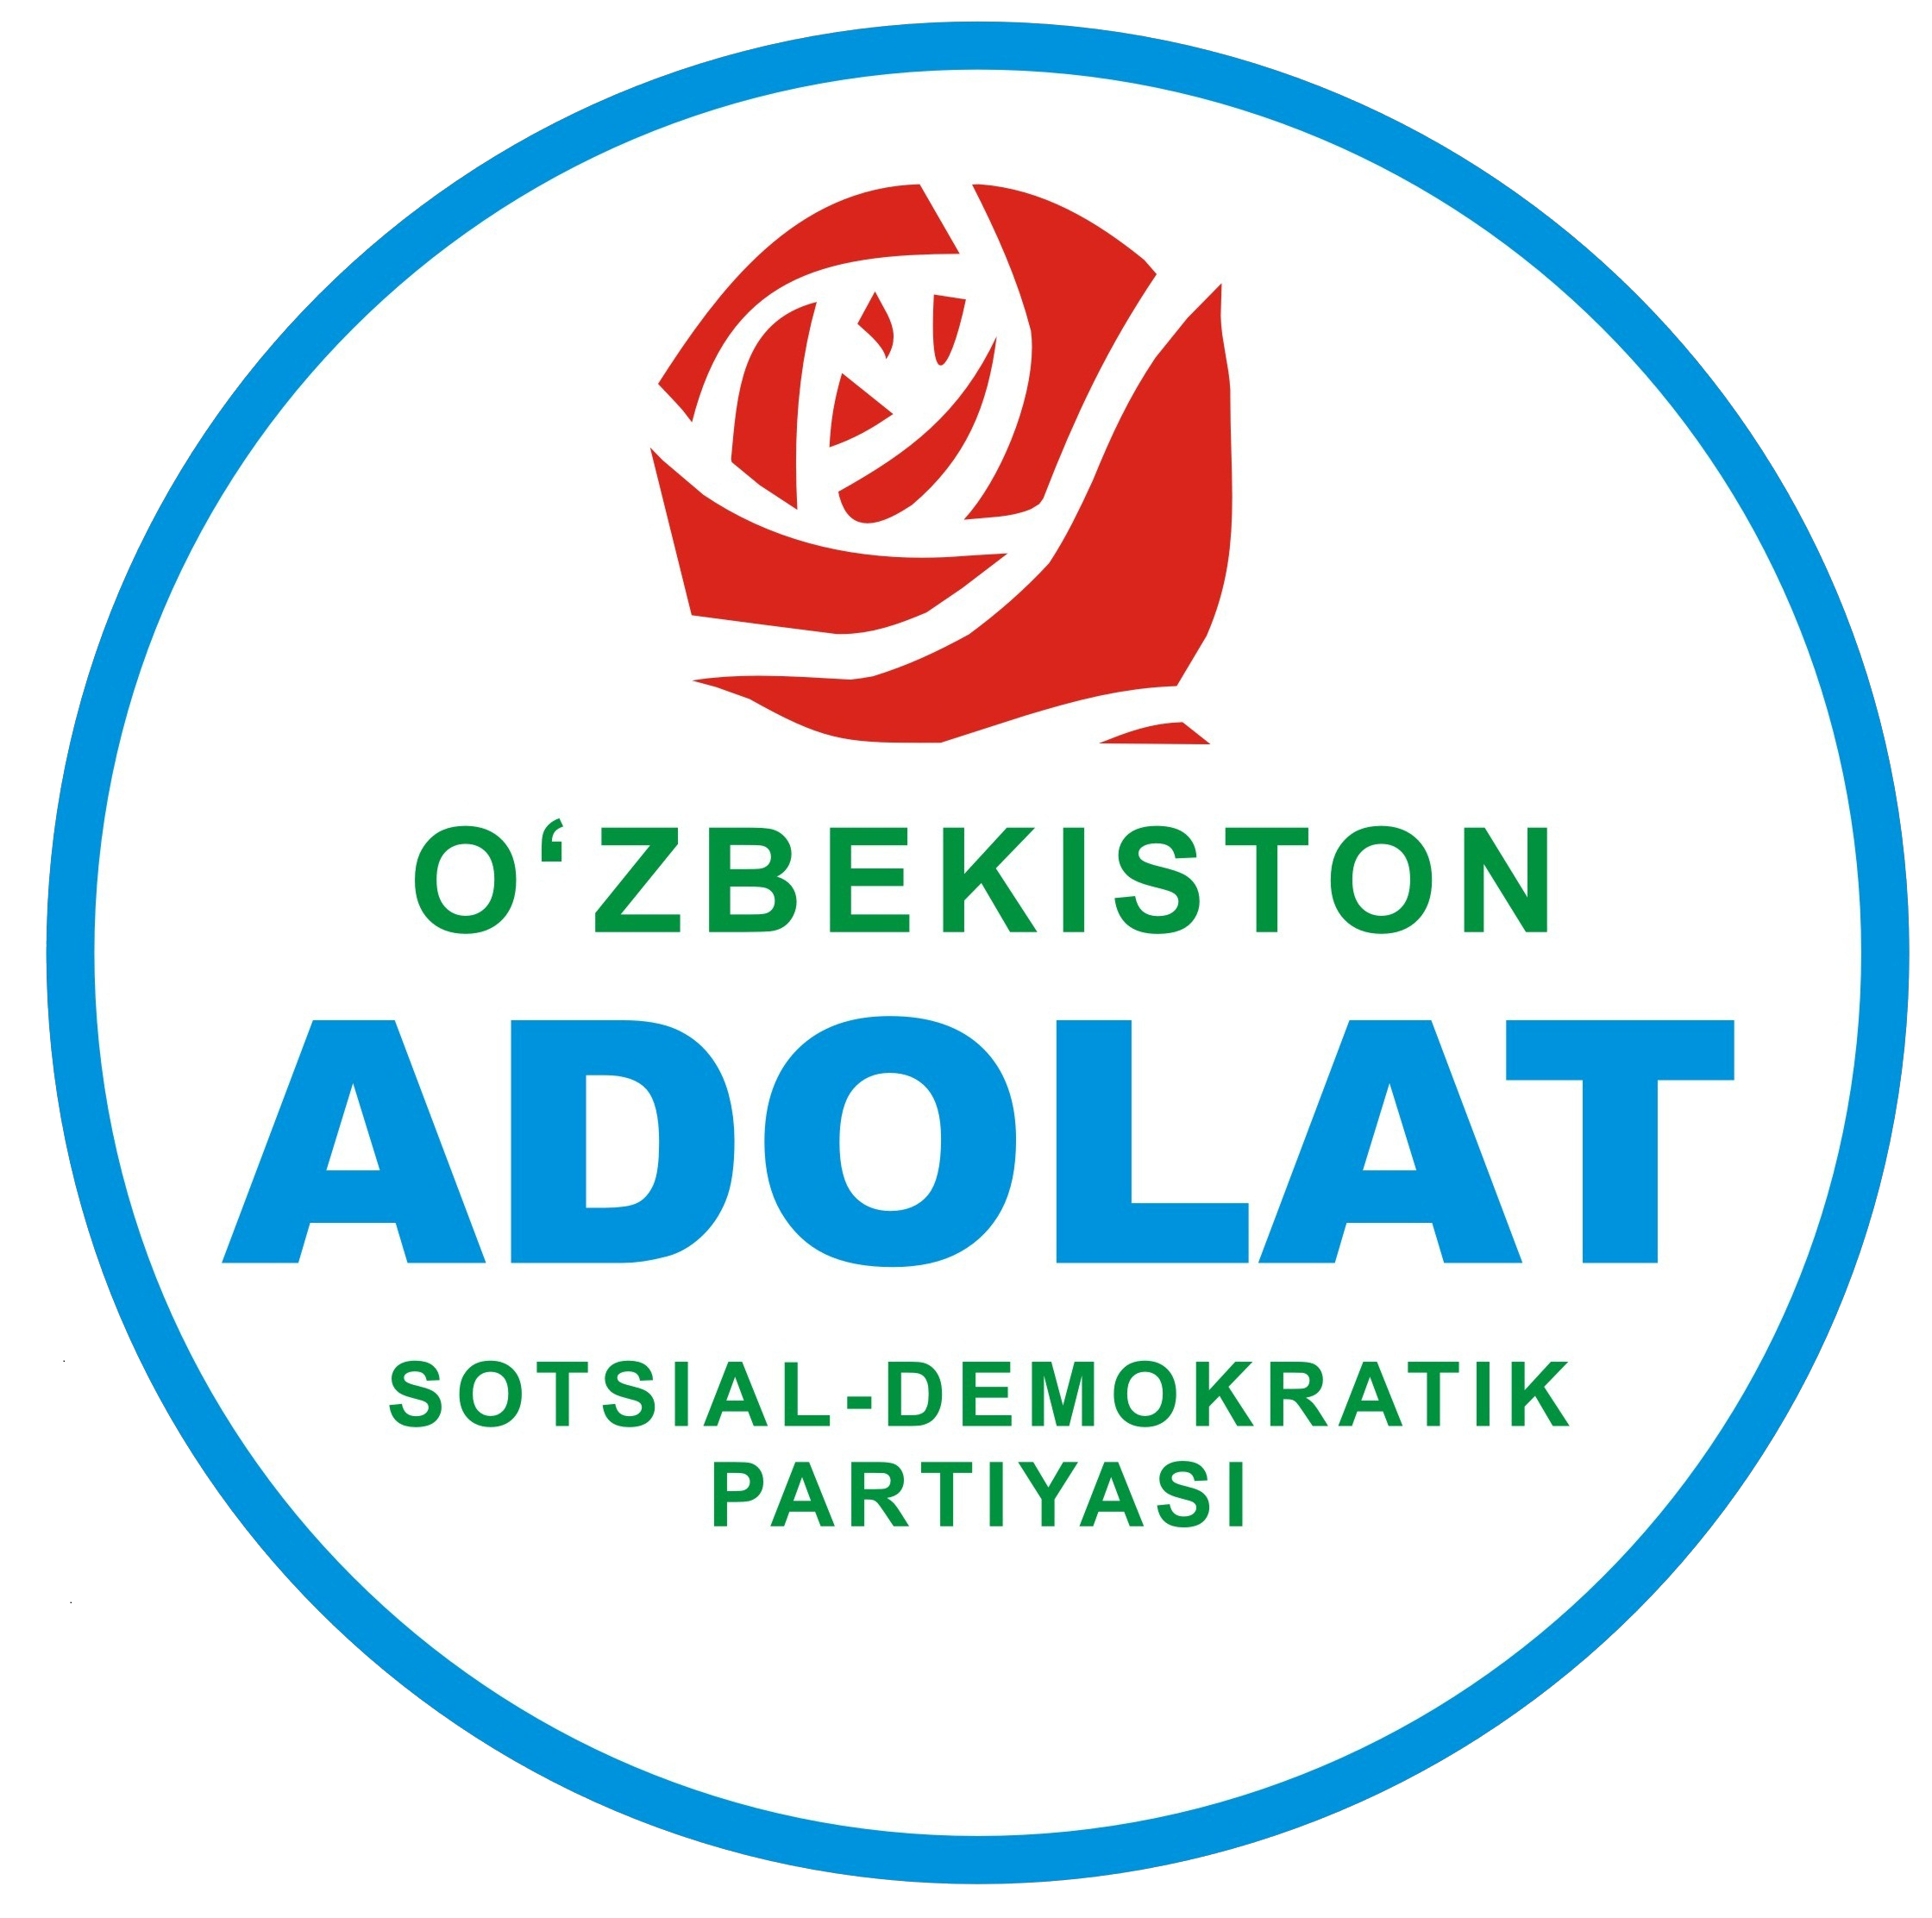 Adolat